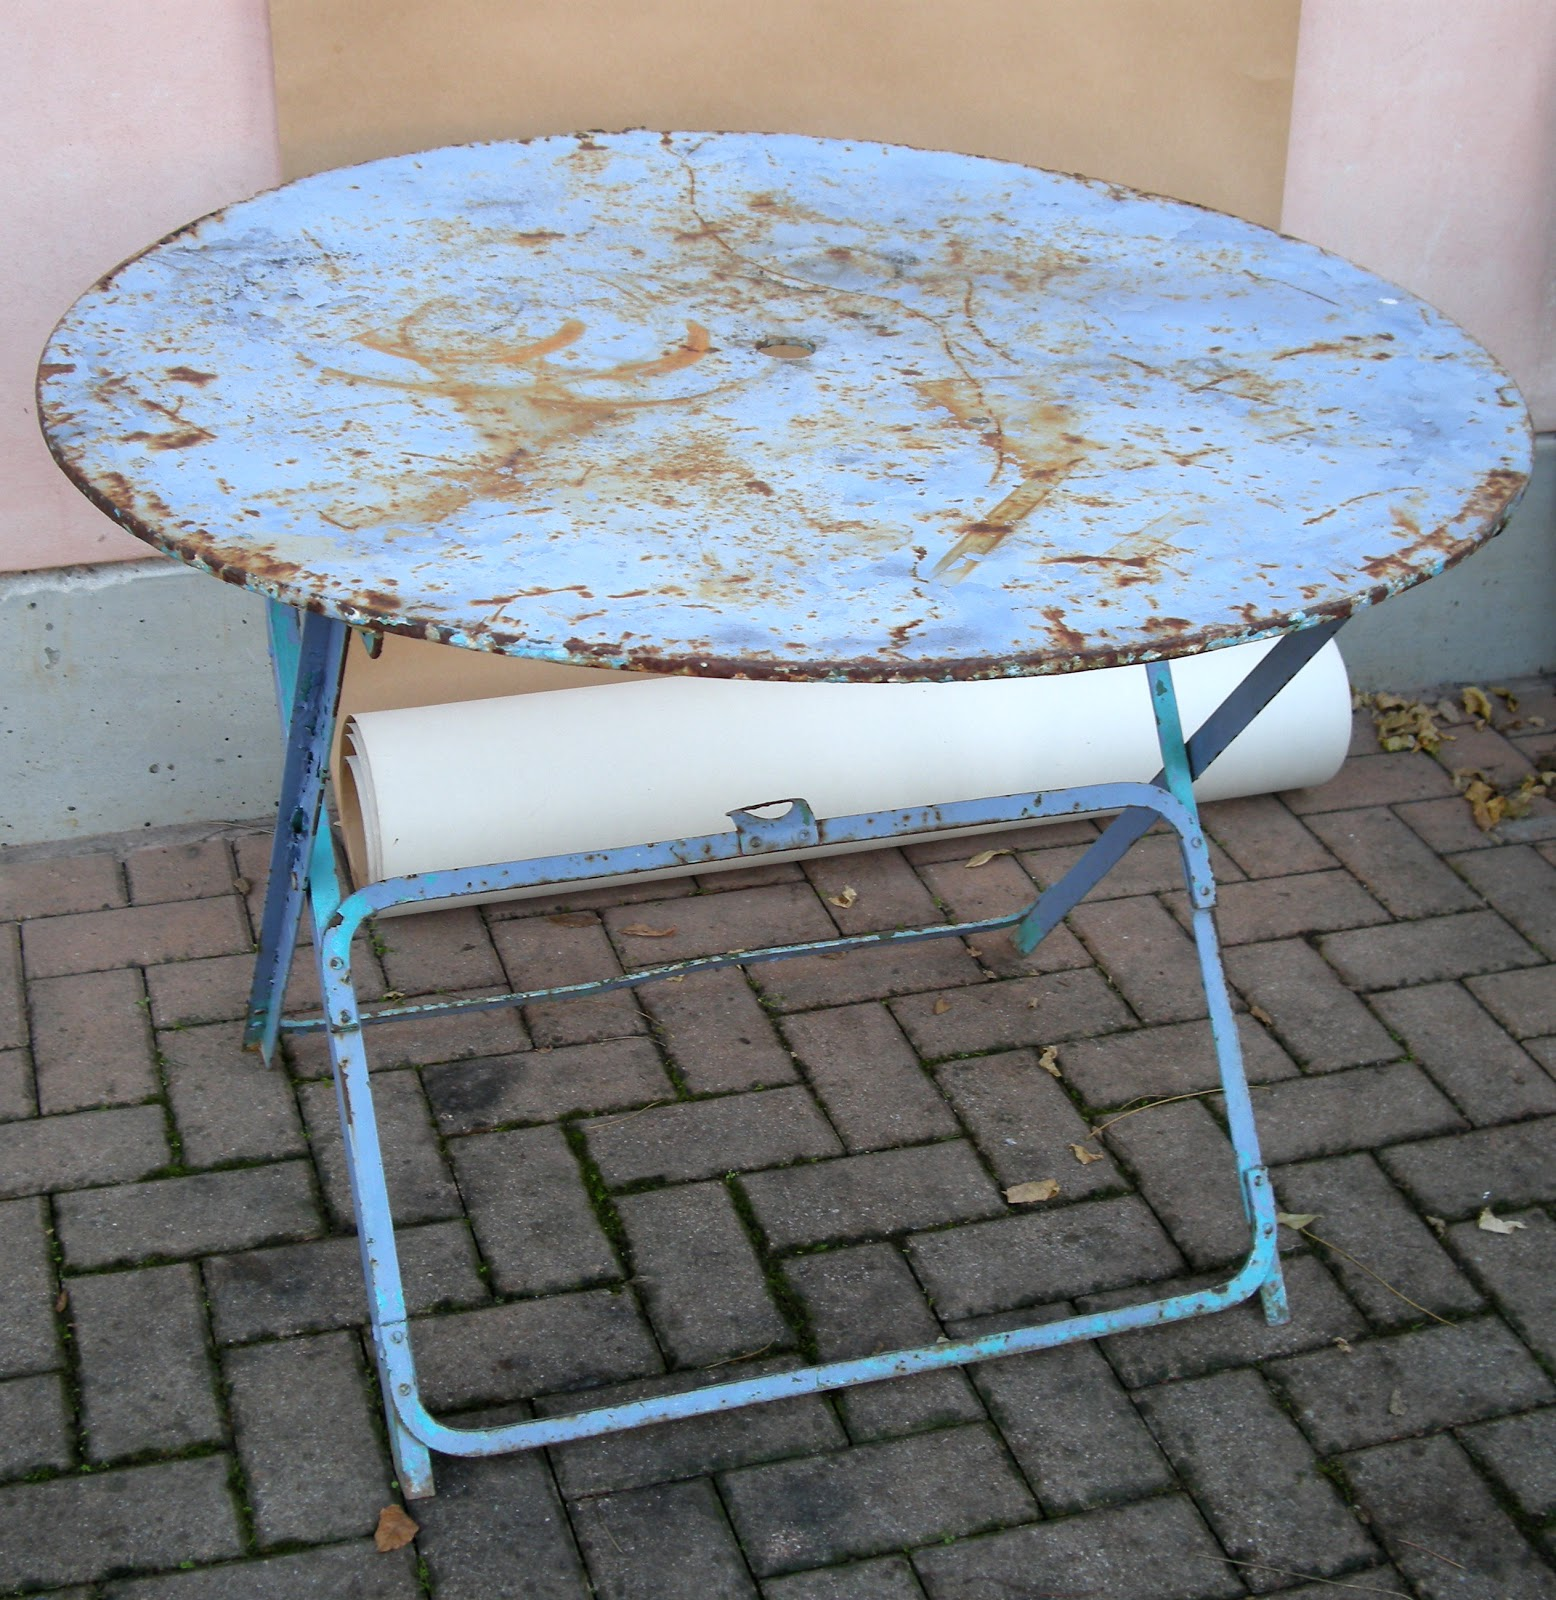 Rimodern tavolo da giardino pieghevole francese french folding garden table - Tavolo giardino pieghevole ...